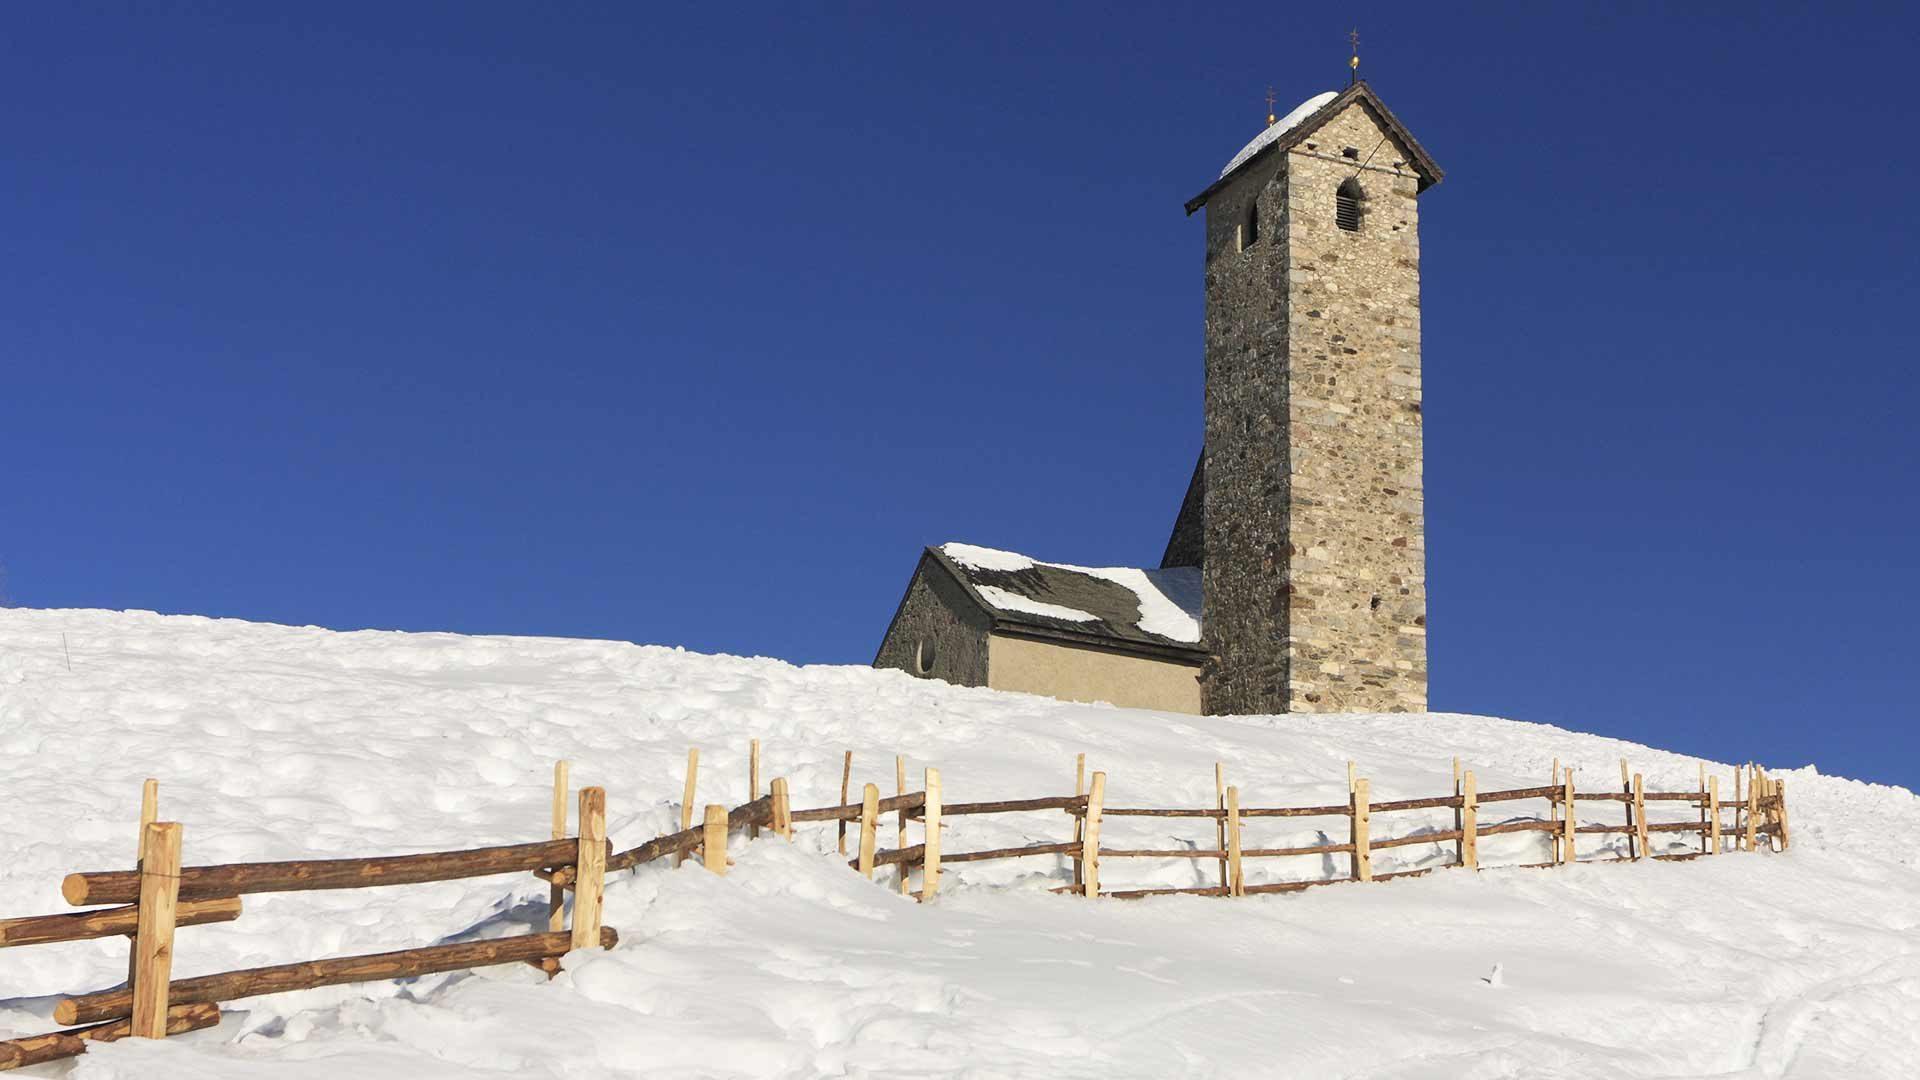 Area sciistica Monte San Vigilio, Alto Adige